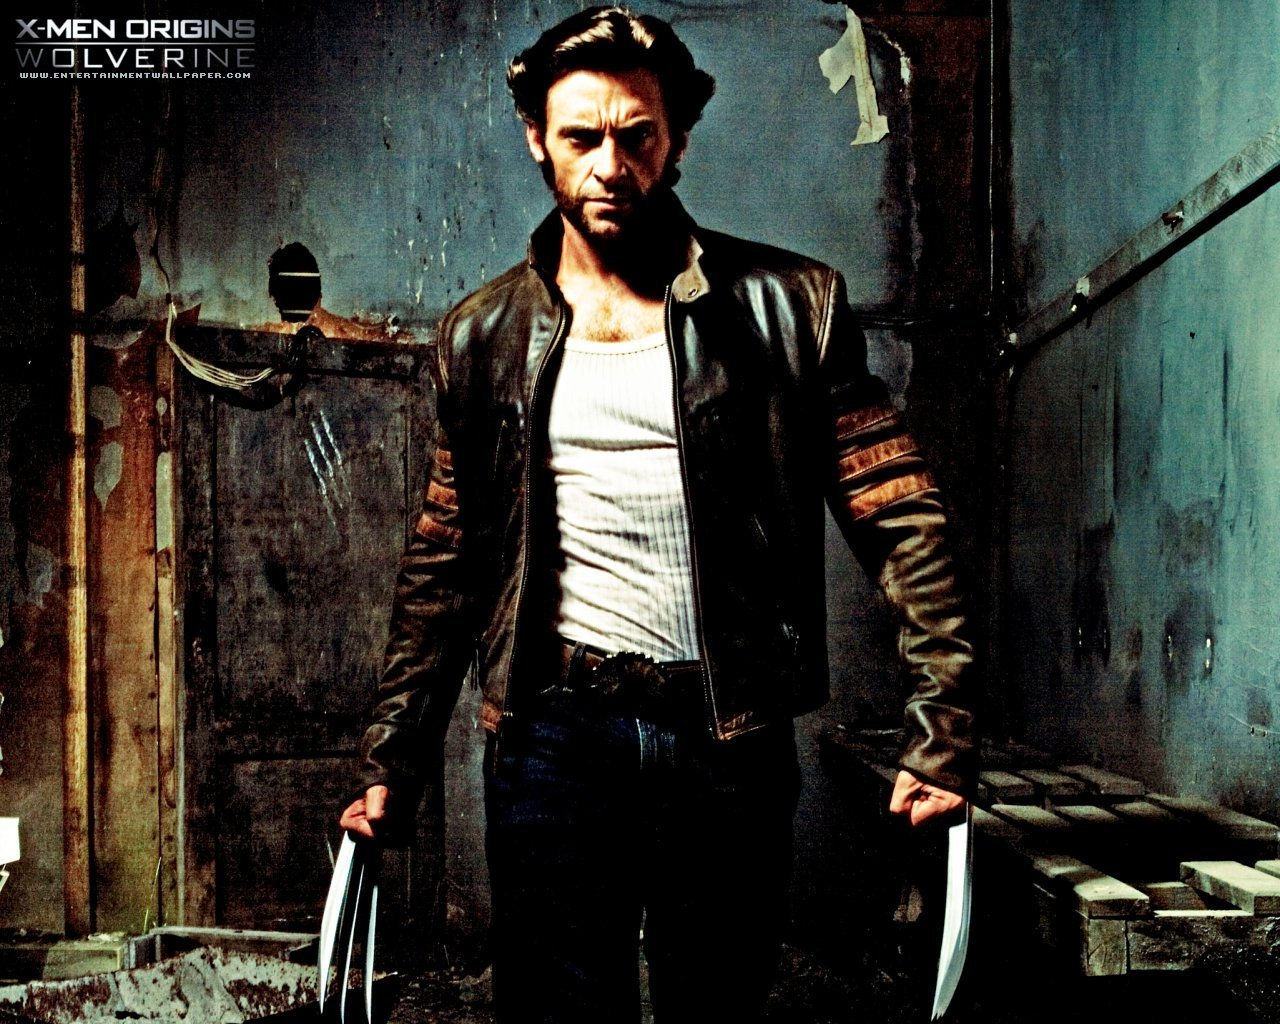 Hd wallpaper x man - Men Origins Wolverine Wallpaper Upcoming Movies Wallpaper